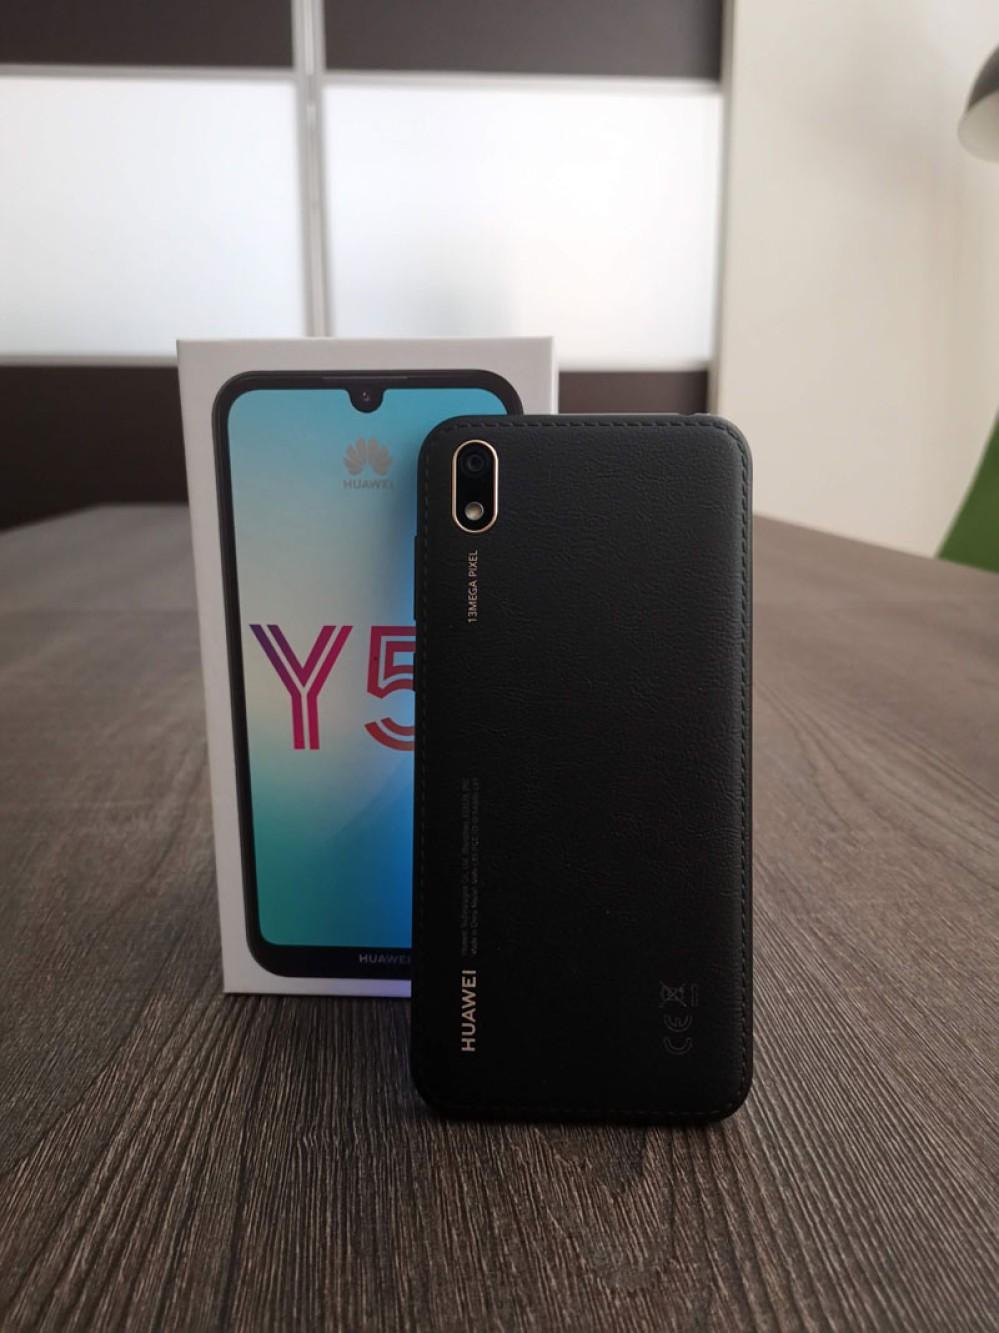 Huawei Y5 2019: Η νέα entry-level πρόταση με μια premium αίσθηση [Review]